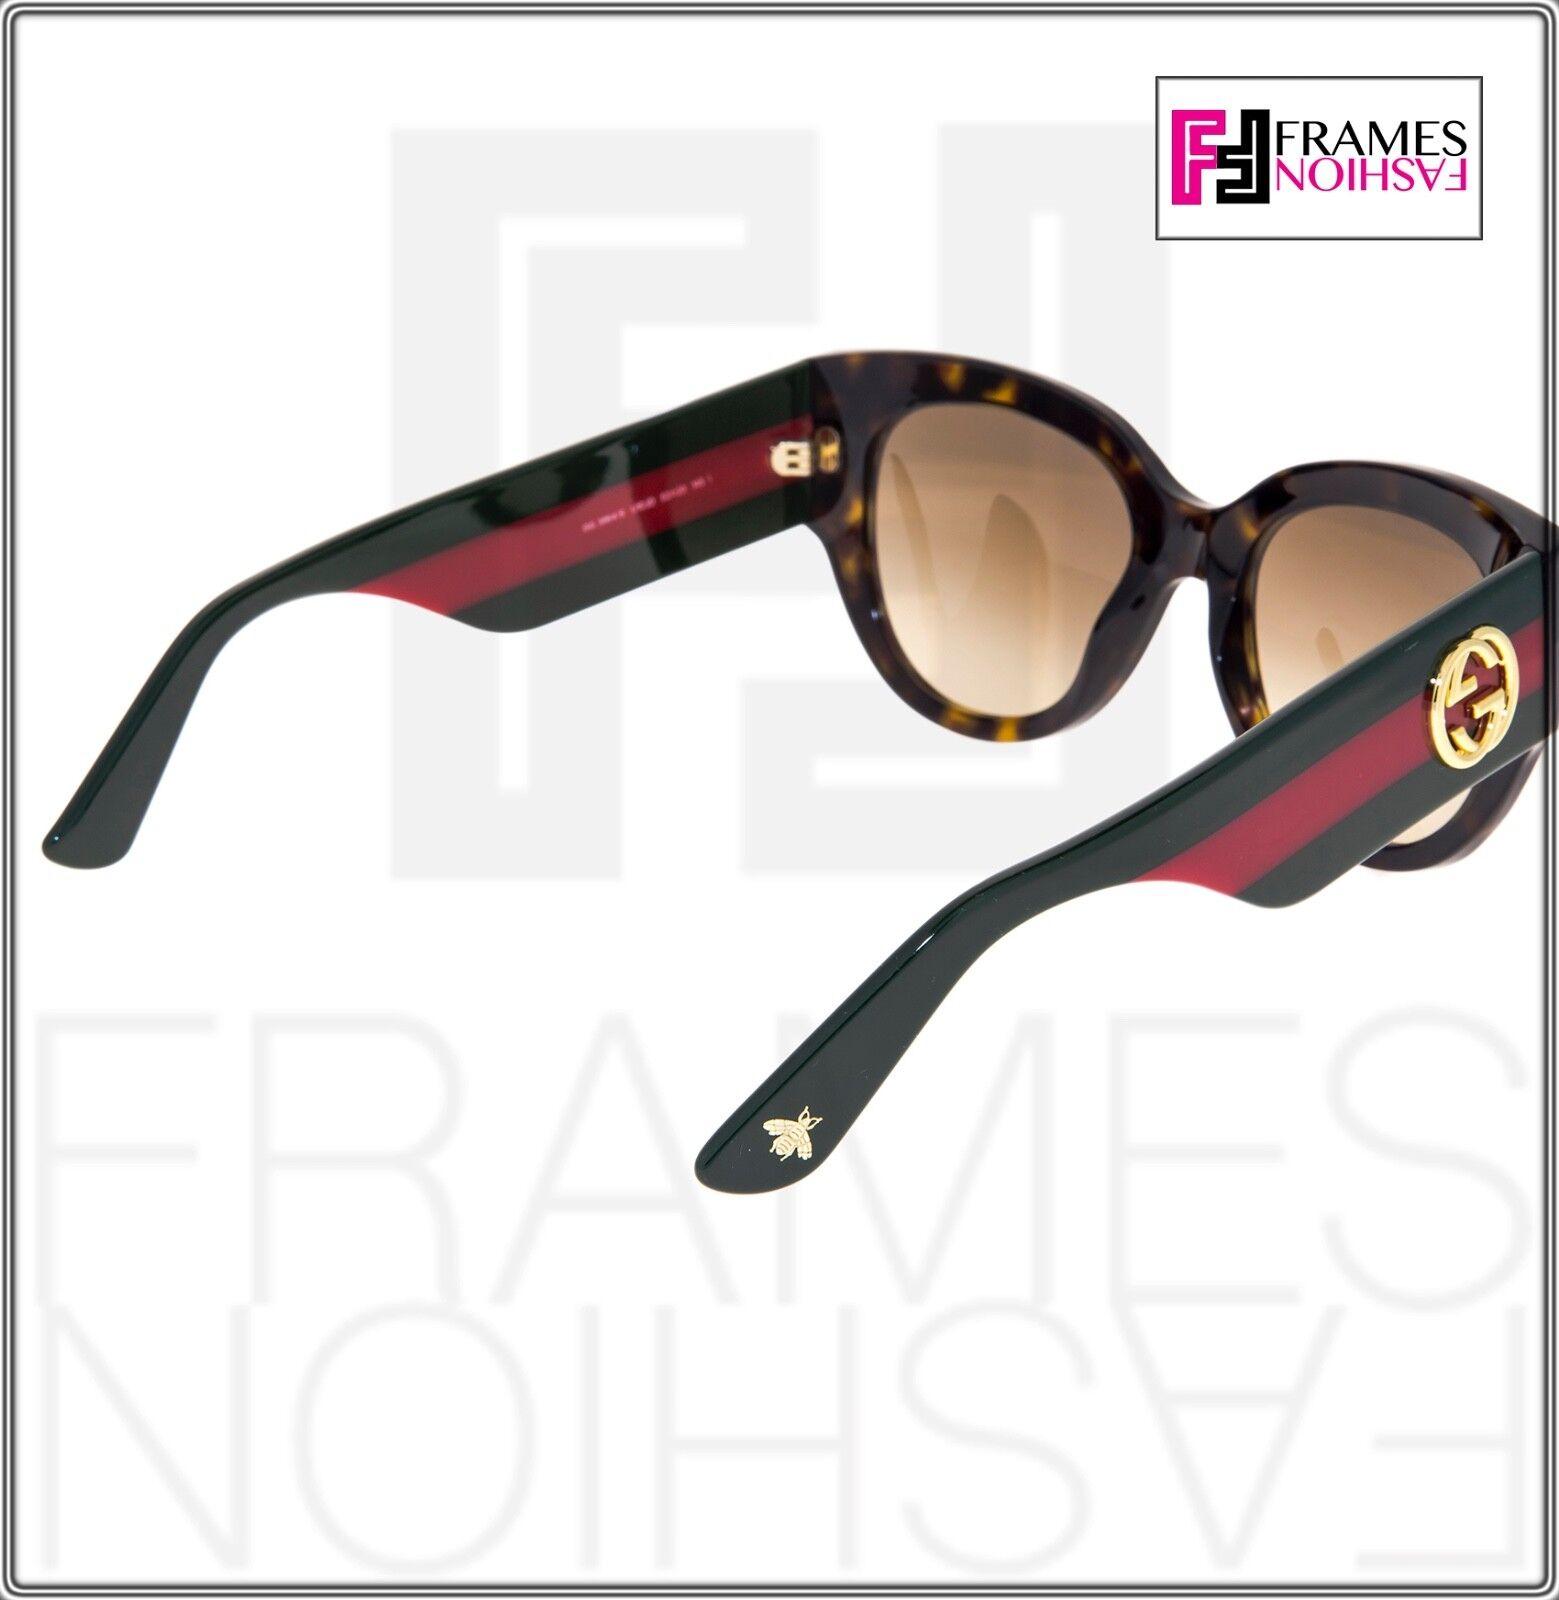 3f83fff4d7c Gucci Gg3864s Red Green Brown Havana Gradient Women Square Sunglasses 3864  Star for sale online